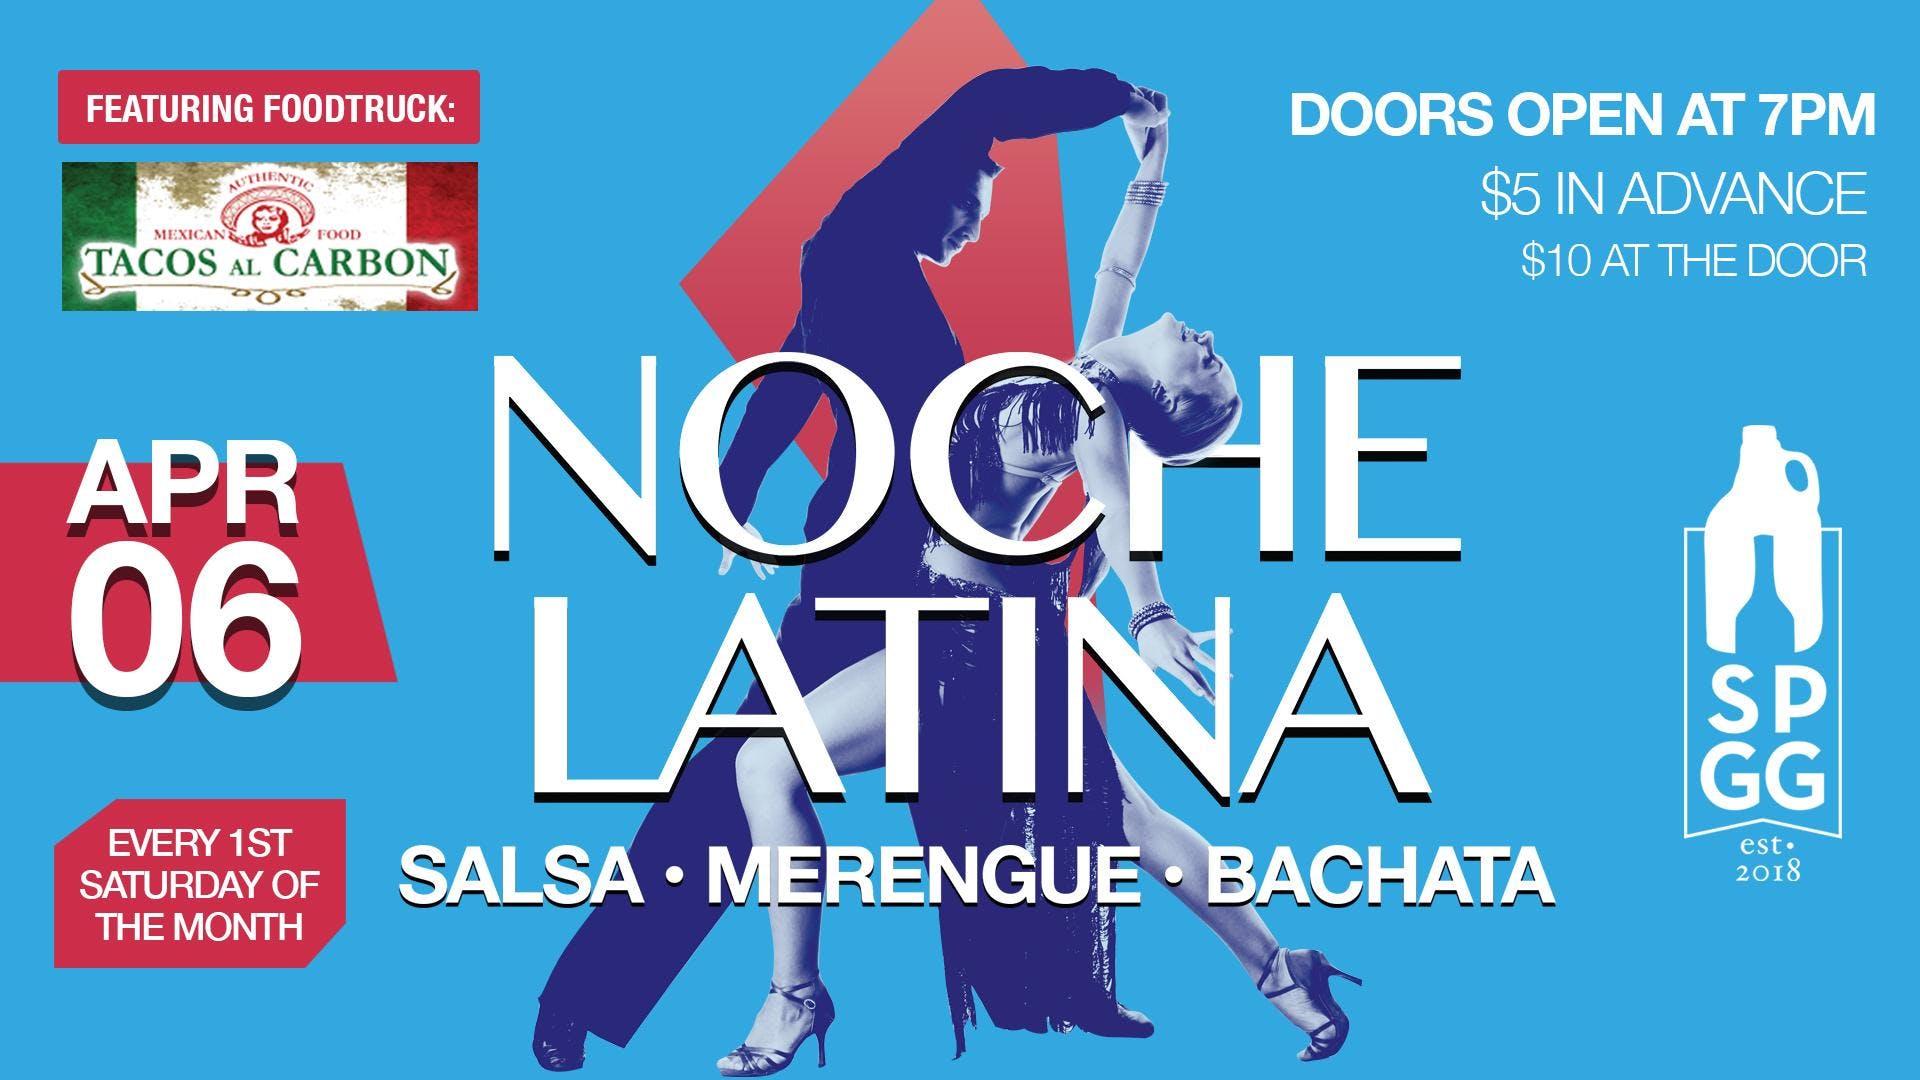 Noche Latina Salsa Merenge Amp Bachata First Saturday Of